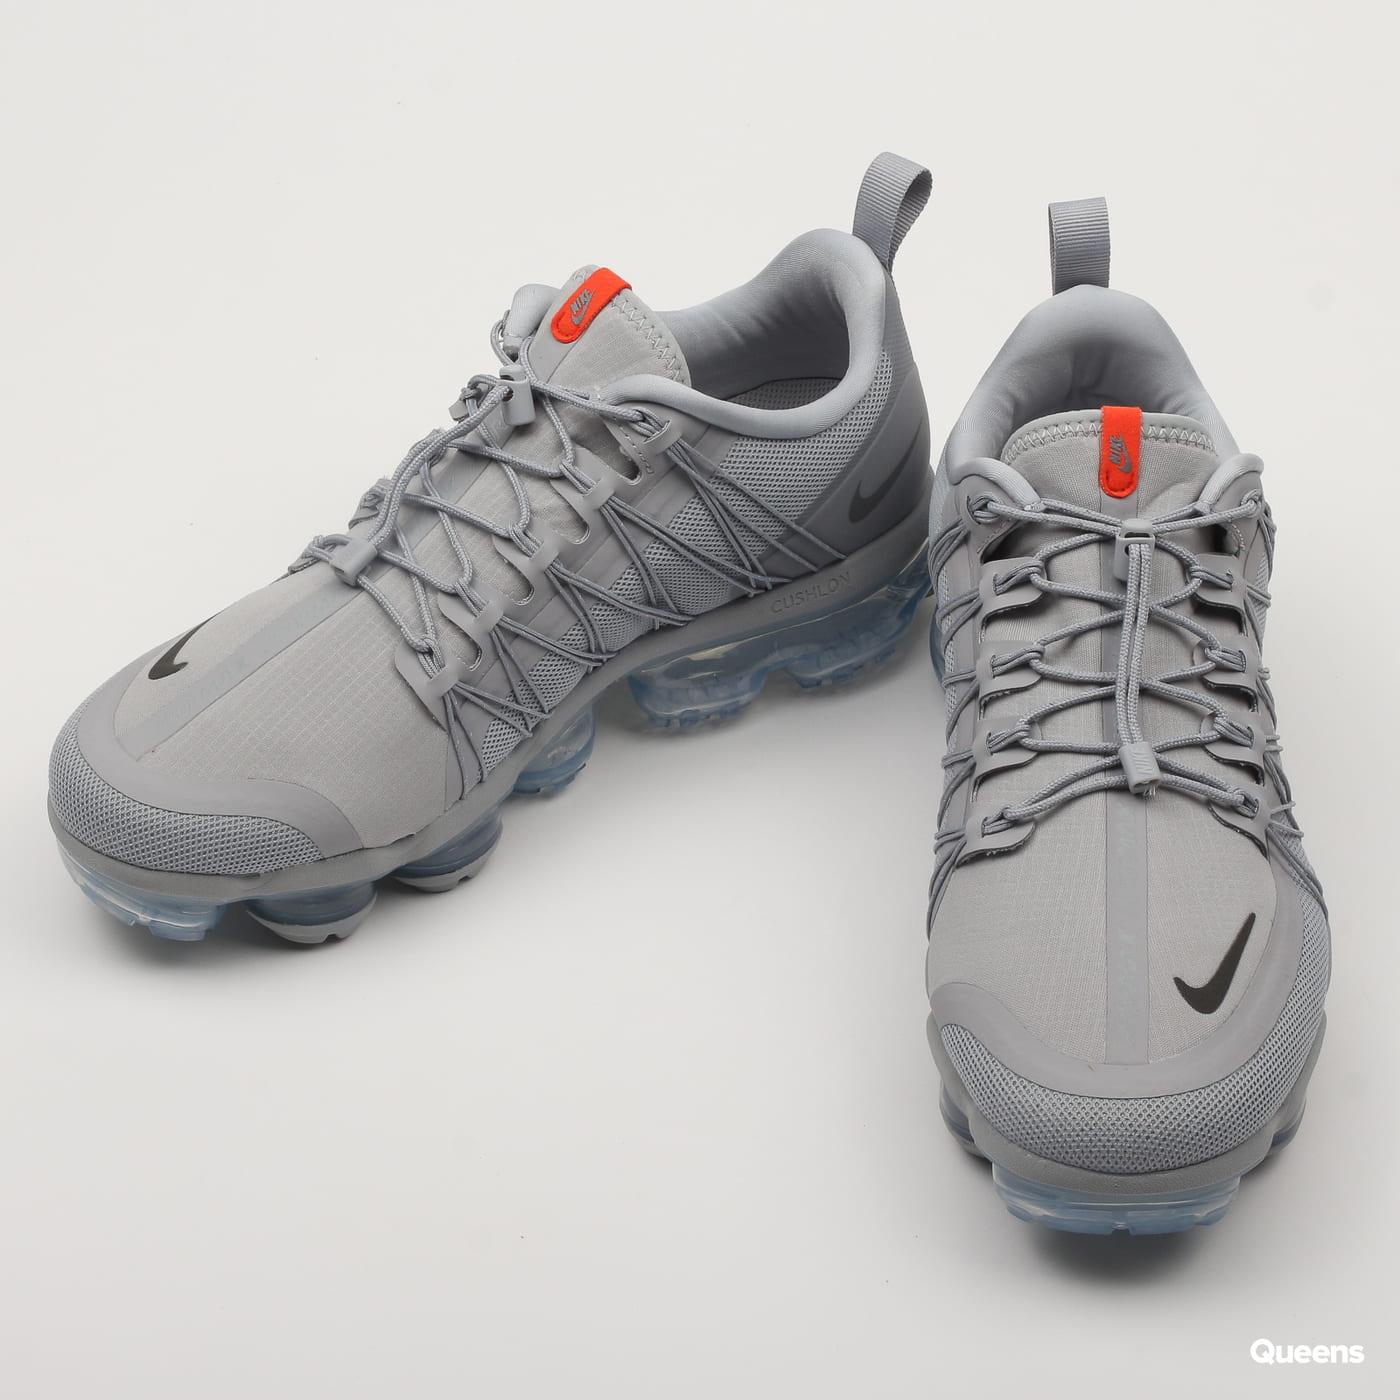 sports shoes 3e8c9 74933 Zoom in Zoom in Zoom in Zoom in Zoom in. Nike Air Vapormax Run Utility ...